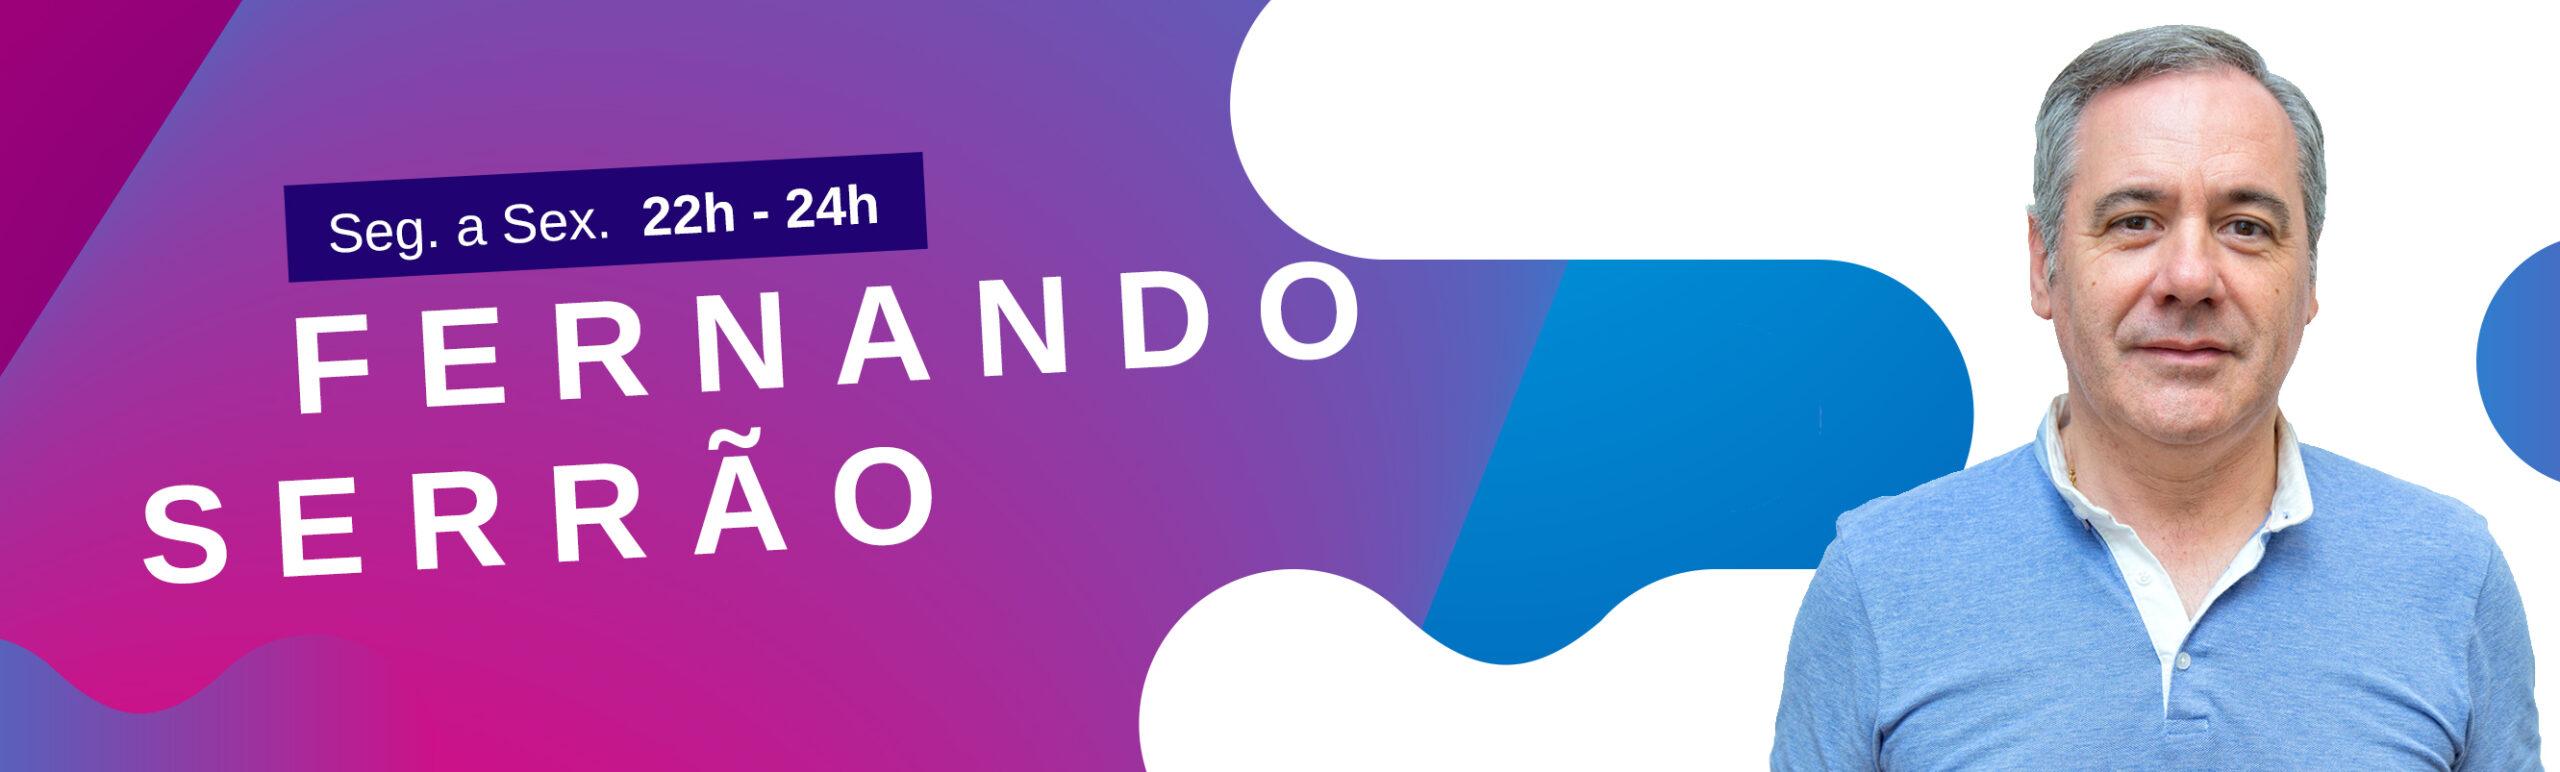 FERNANDO-SERRAO-2020-scaled